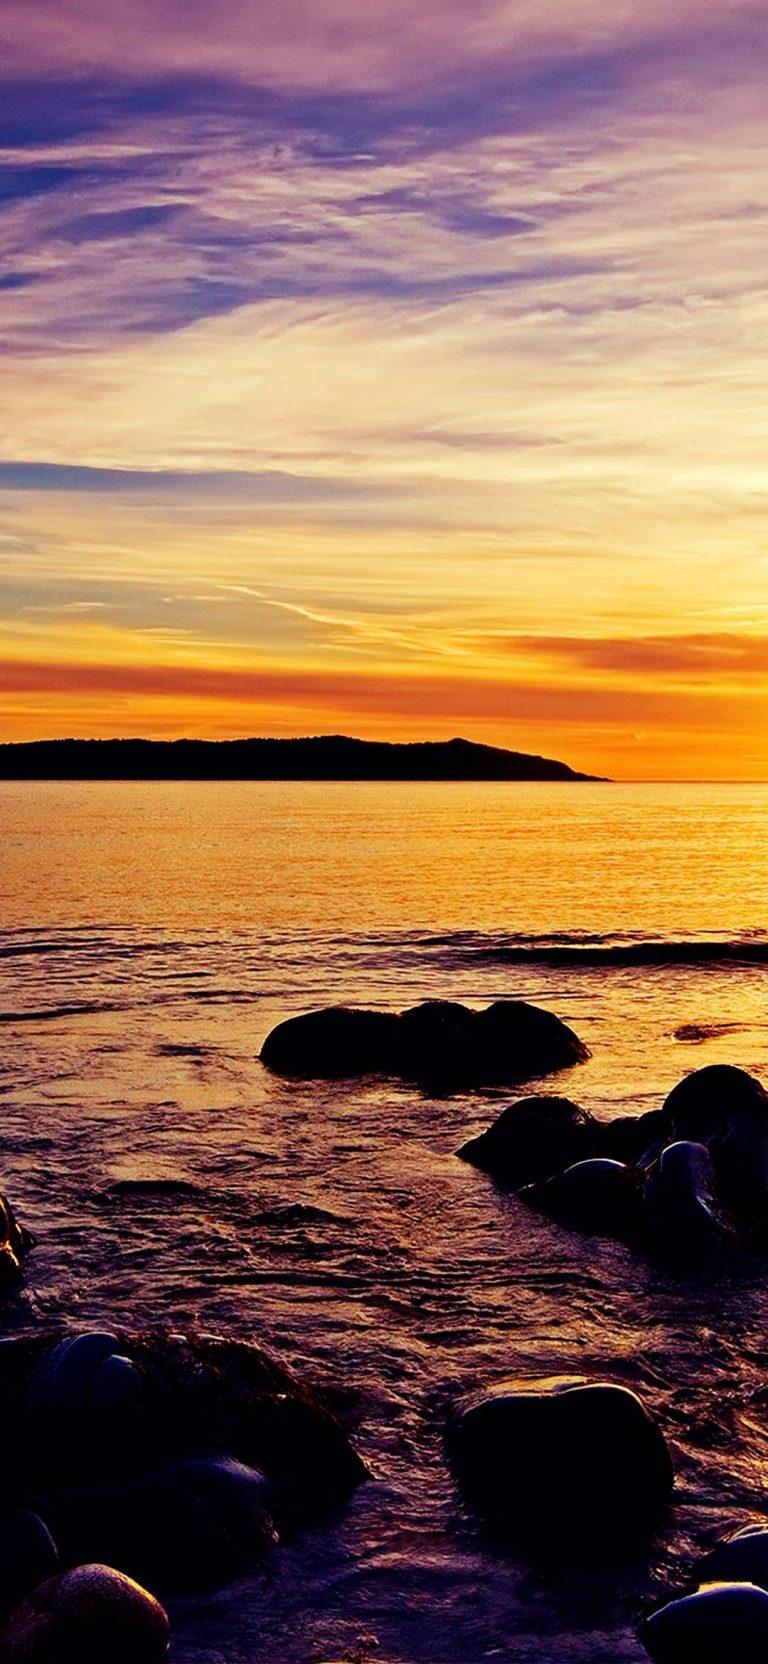 Sunrise Beach 1080x2340 768x1664